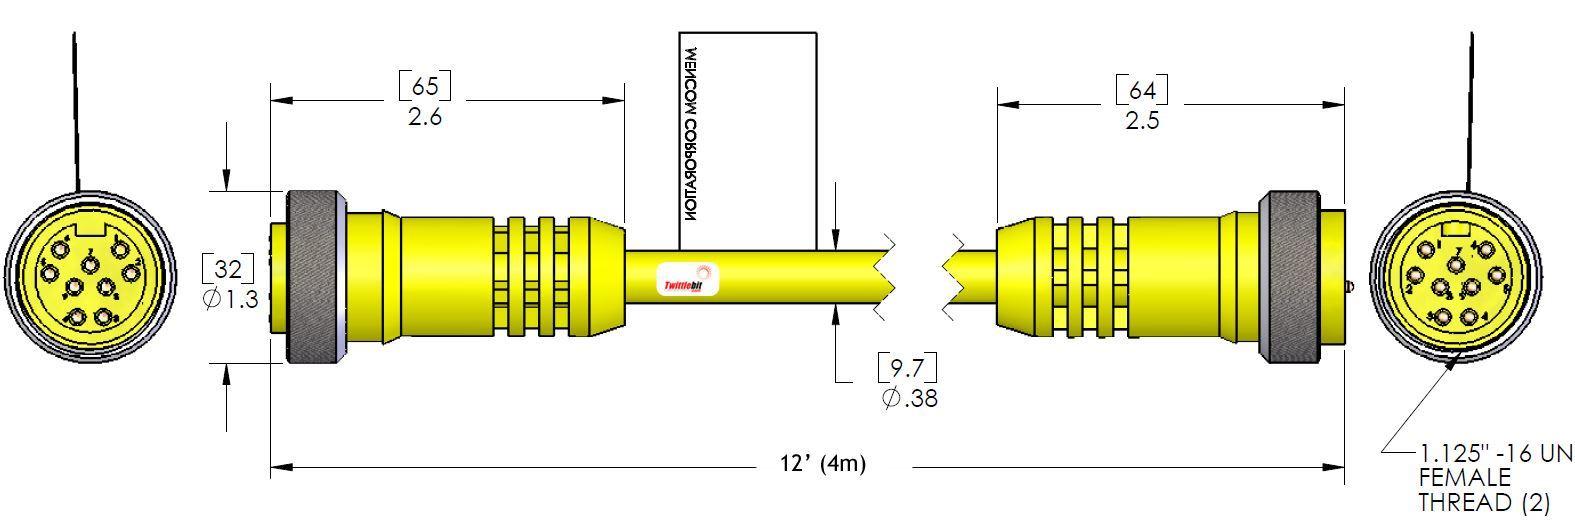 MIN9MFPX12, MINI (Size 3) 9 Pole PVC Straight Cables